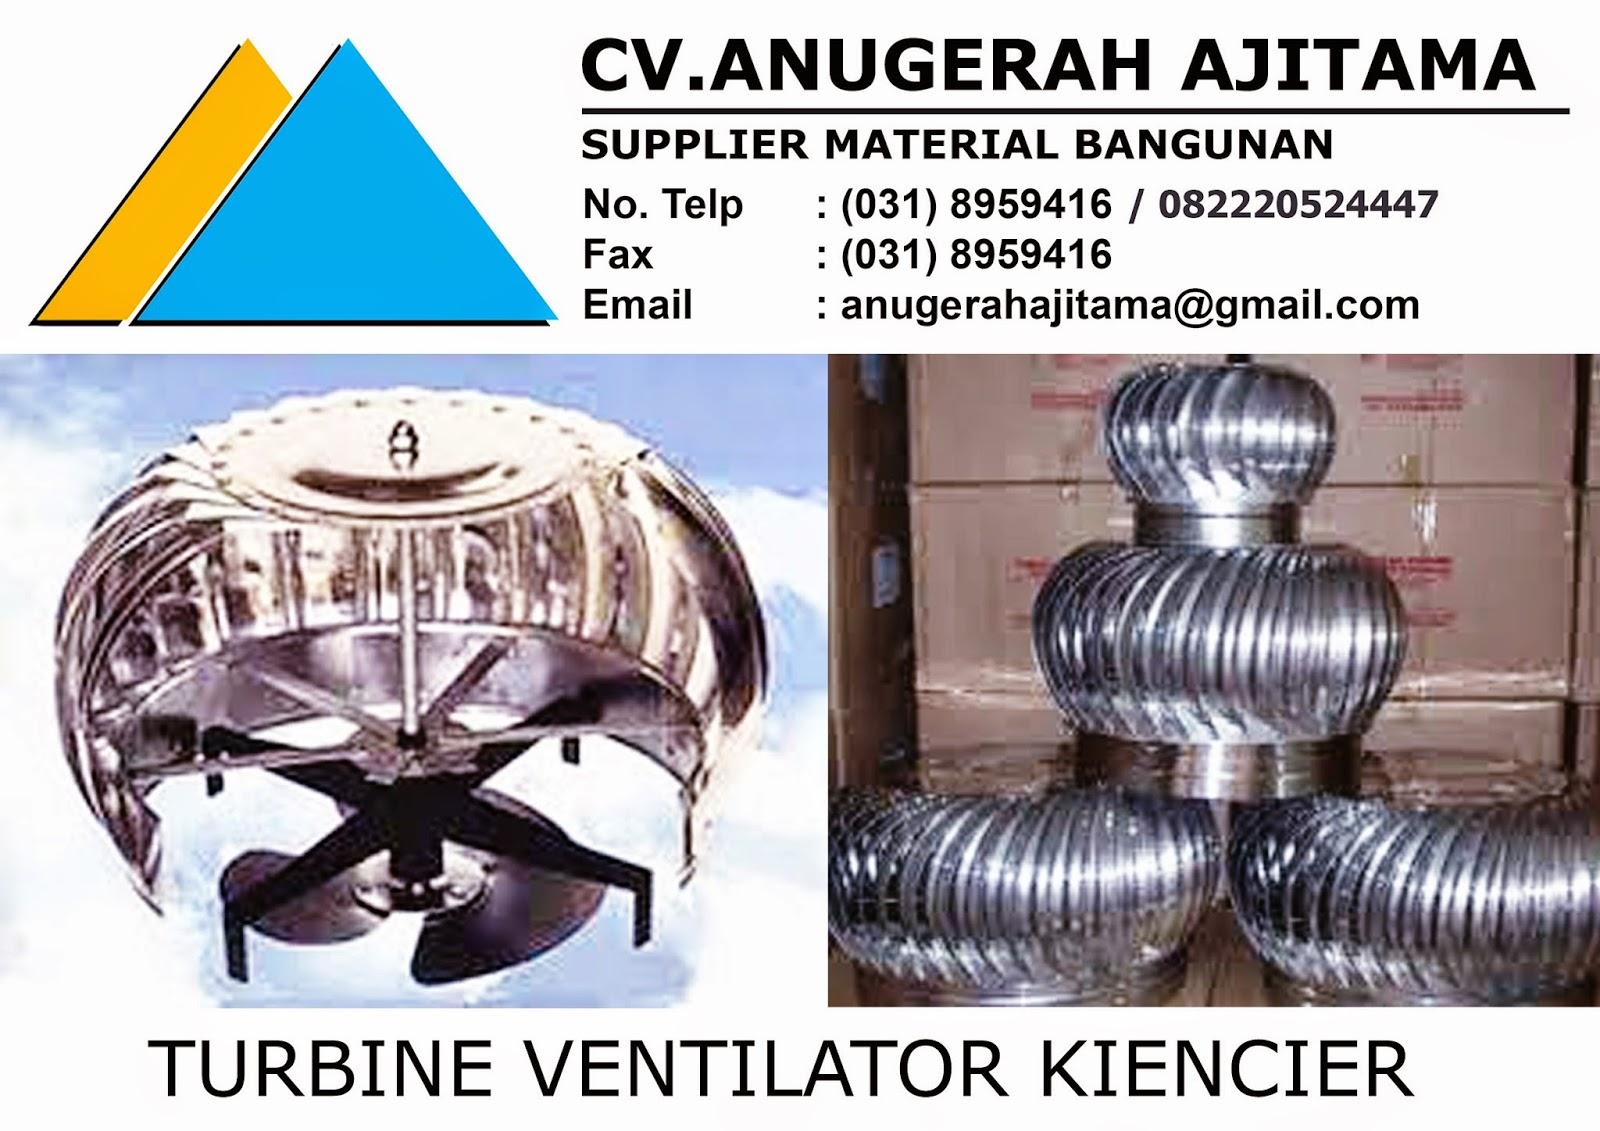 Jual Turbin Ventilator Kiencier Surabaya